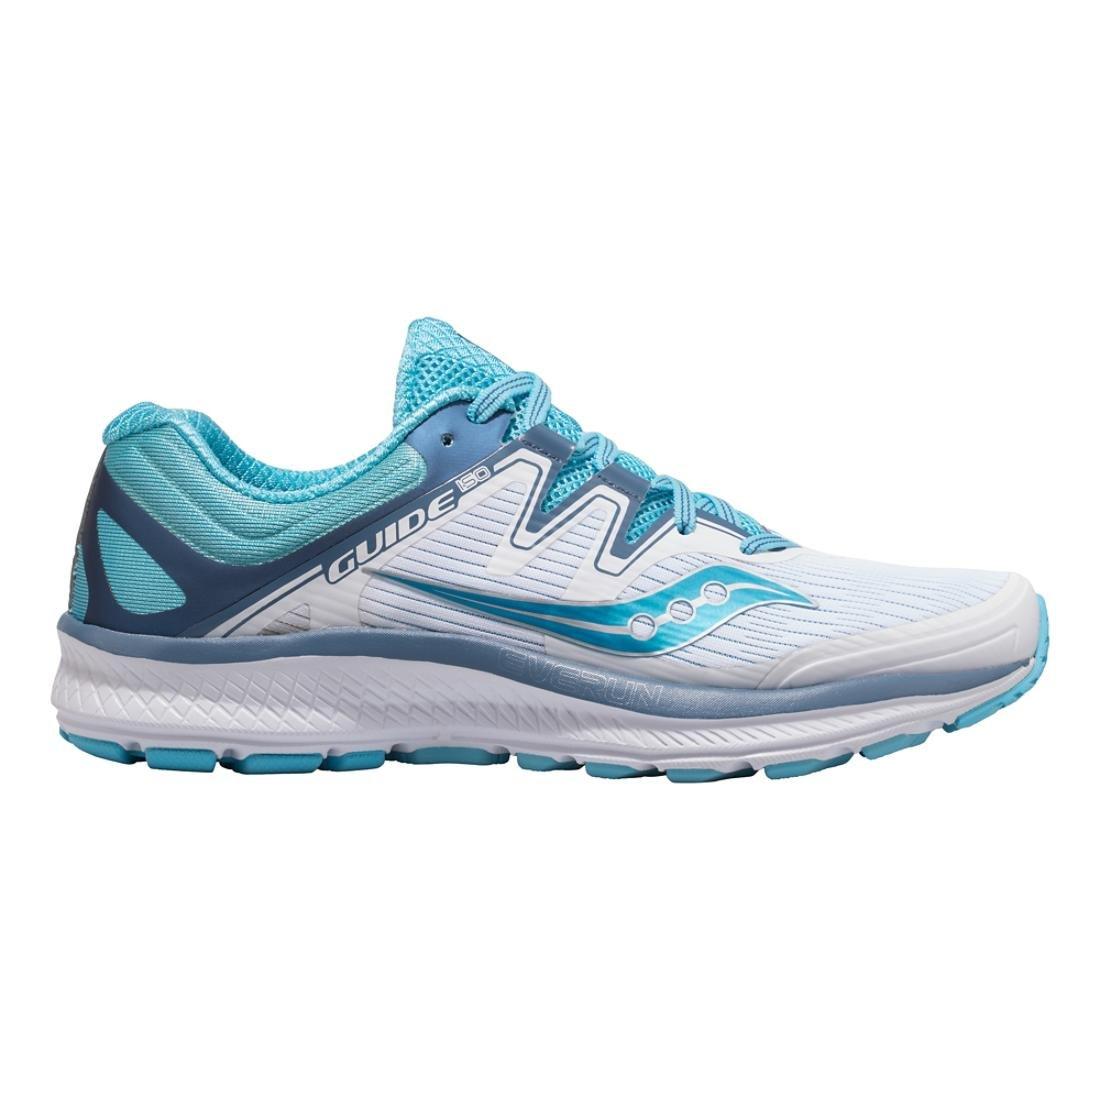 Saucony Women's Guide Iso Running Shoe B078PNZ3RR 6.5 B(M) US|White/Blue